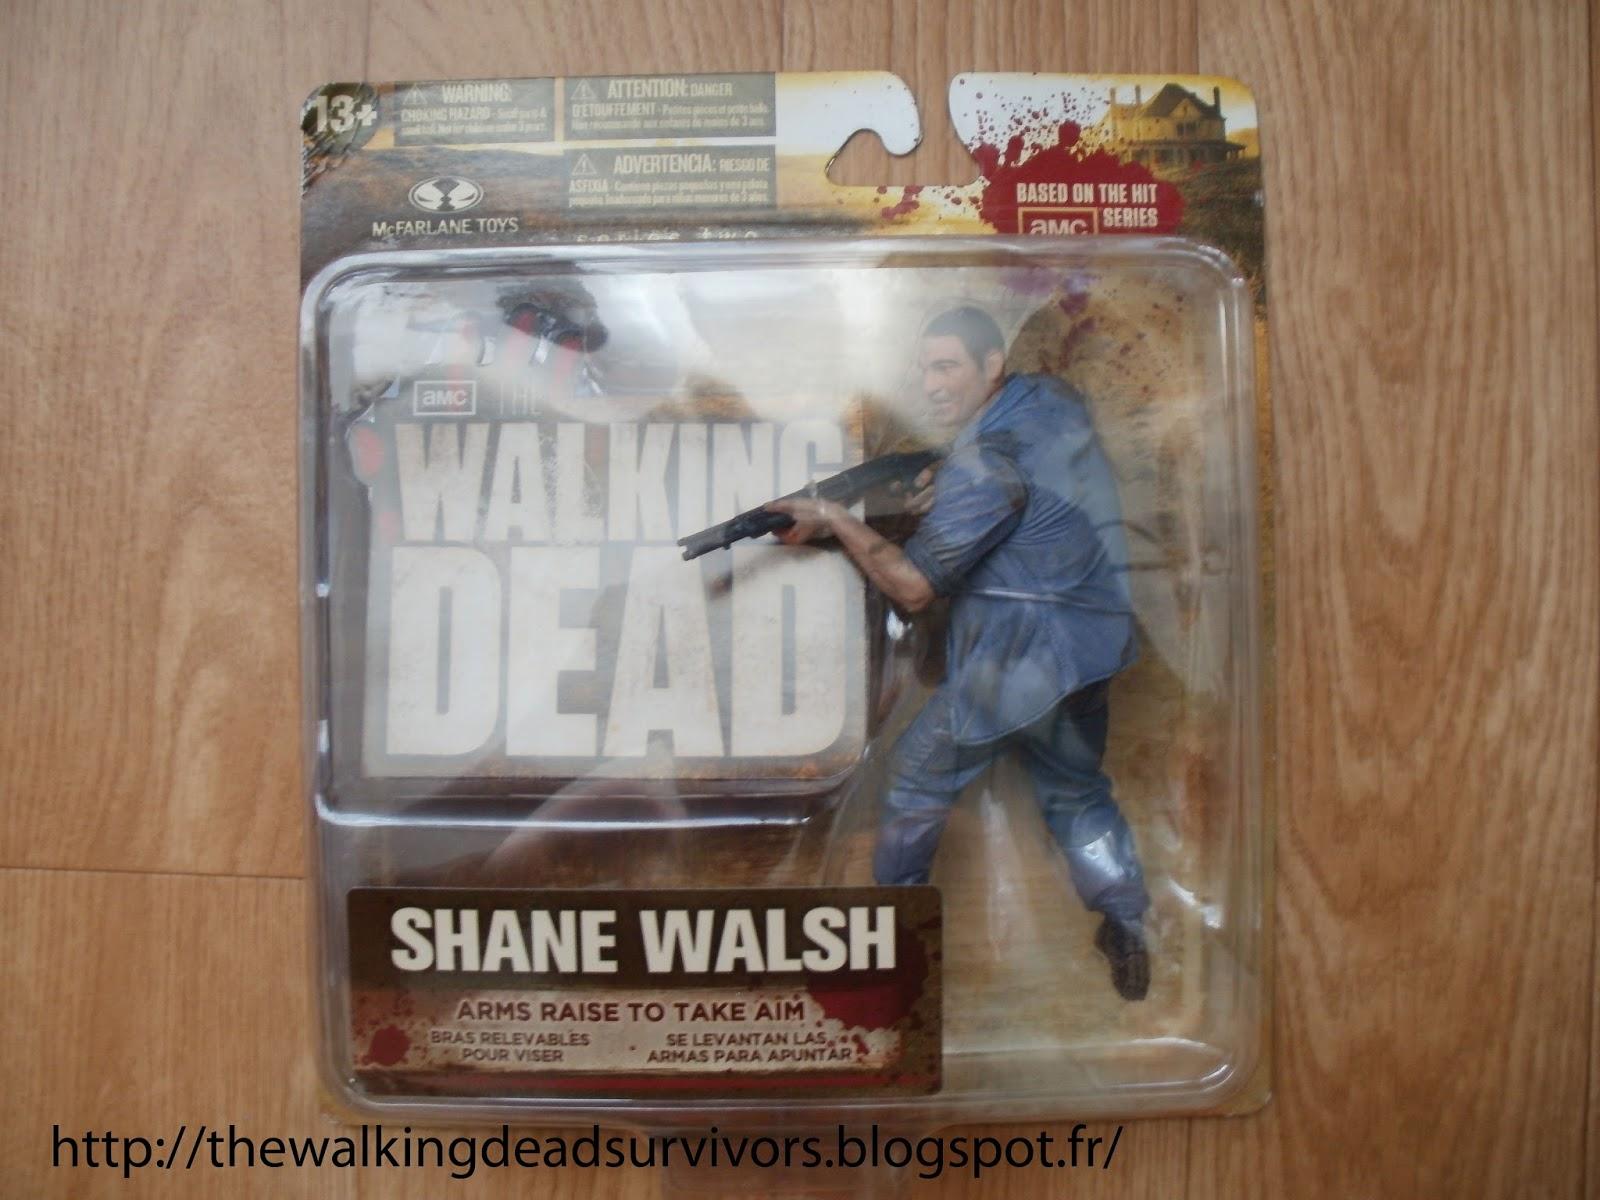 The Walking Dead Survivors Collection